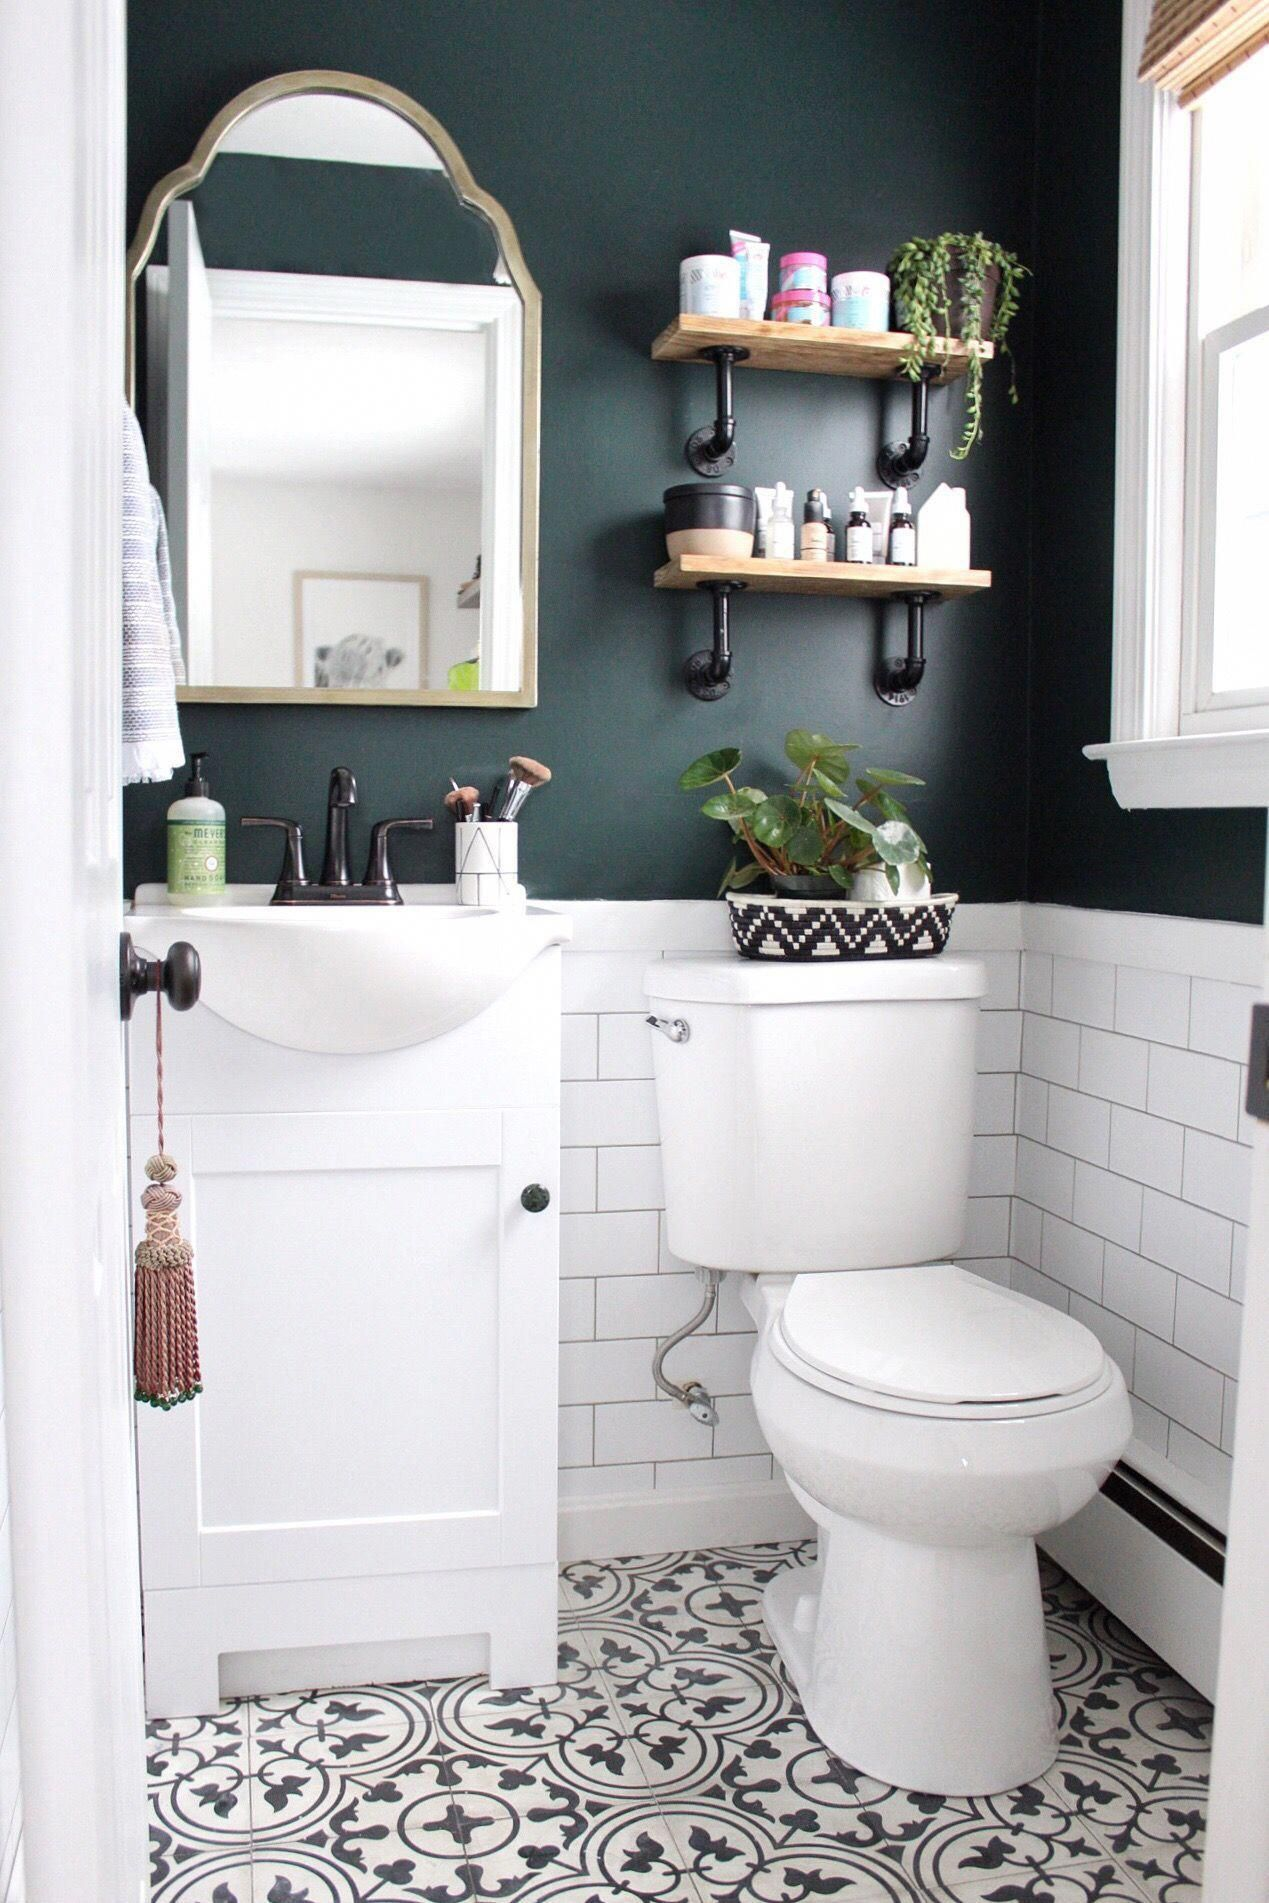 14 Genius Concepts Of How To Upgrade Best Bathroom Colors Benjamin Moore In 2020 Bathroom Design Small Small Bathroom Makeover Best Bathroom Colors